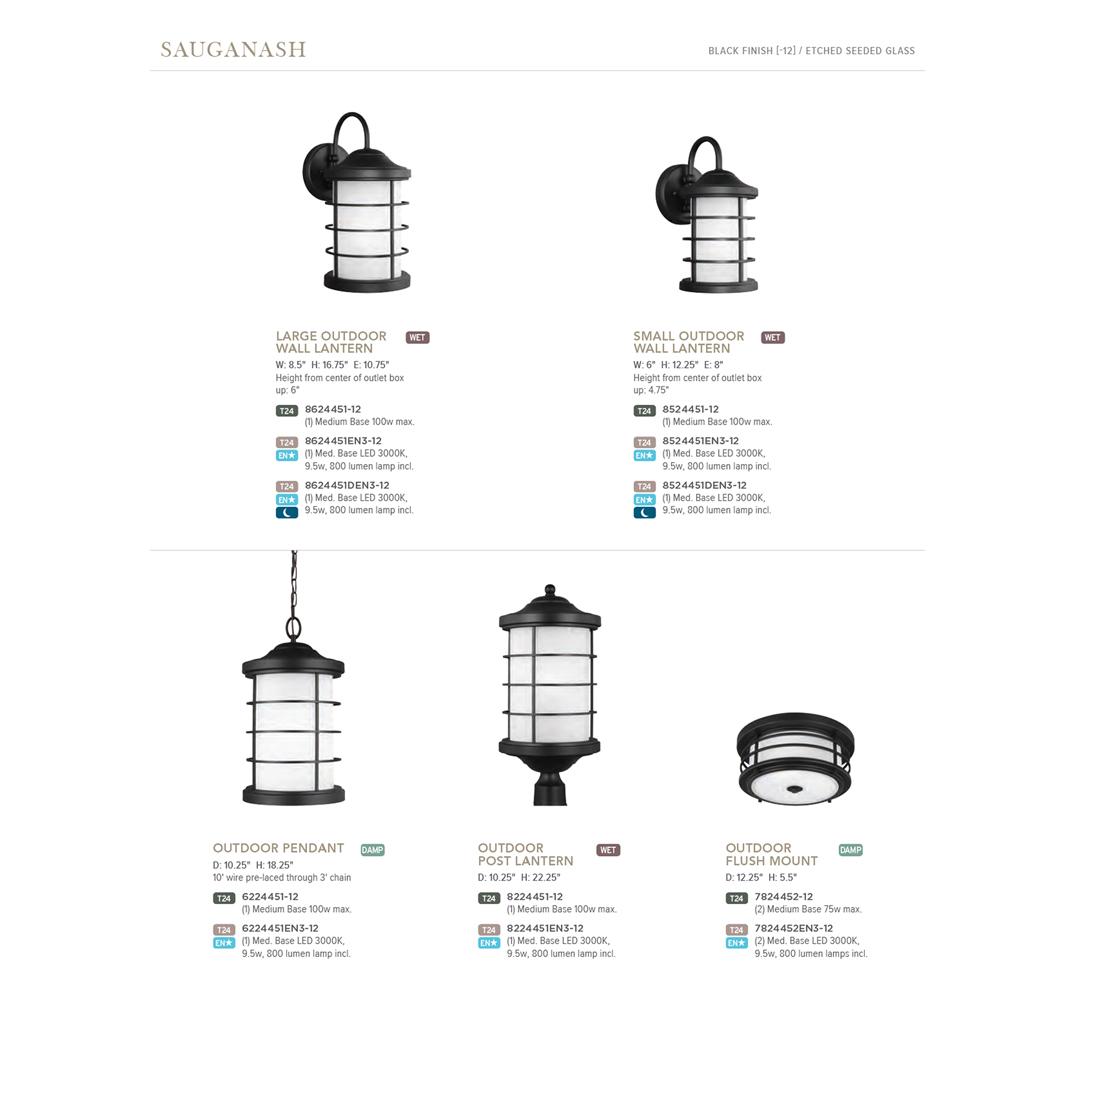 Sea Gull Lighting Sauganash Black 2 Light Outdoor Flush Mount With Led Bulbs En3 12